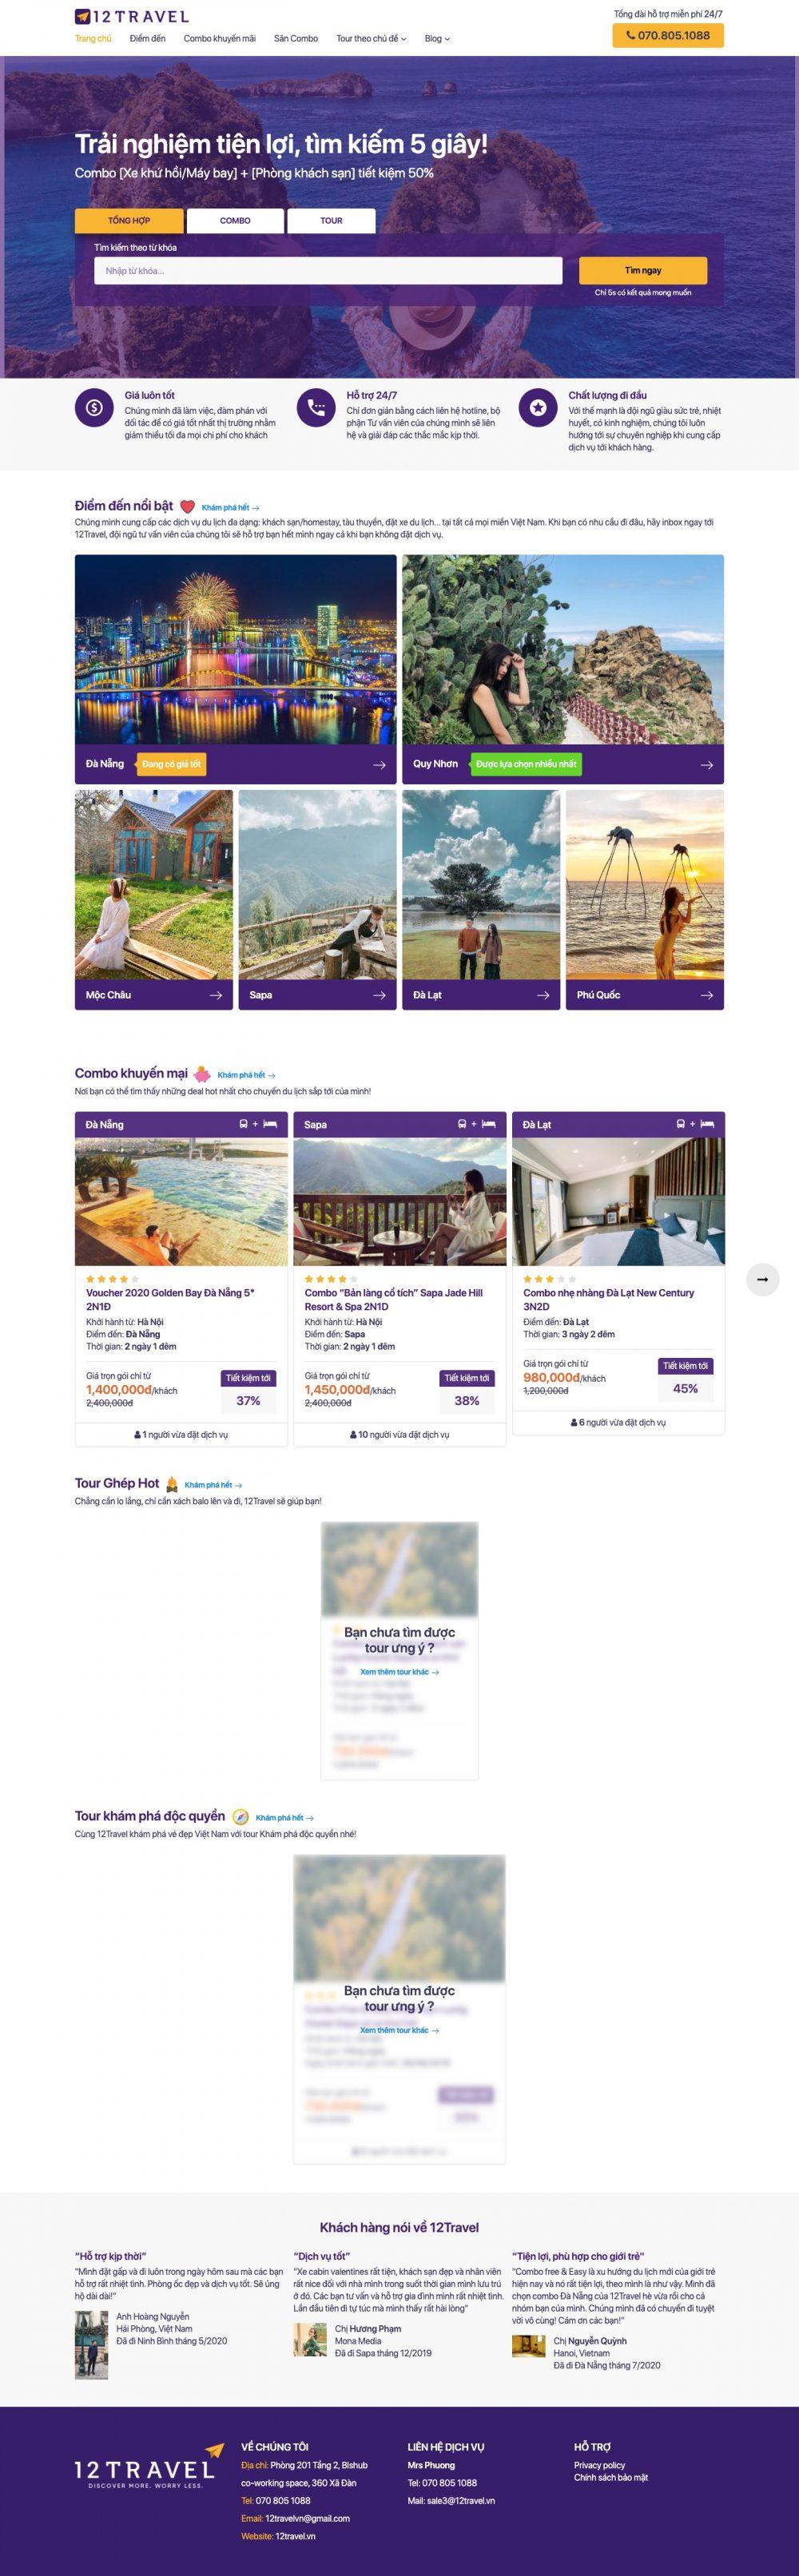 12TRAVEL – Chuyên cung cấp tour du lịch